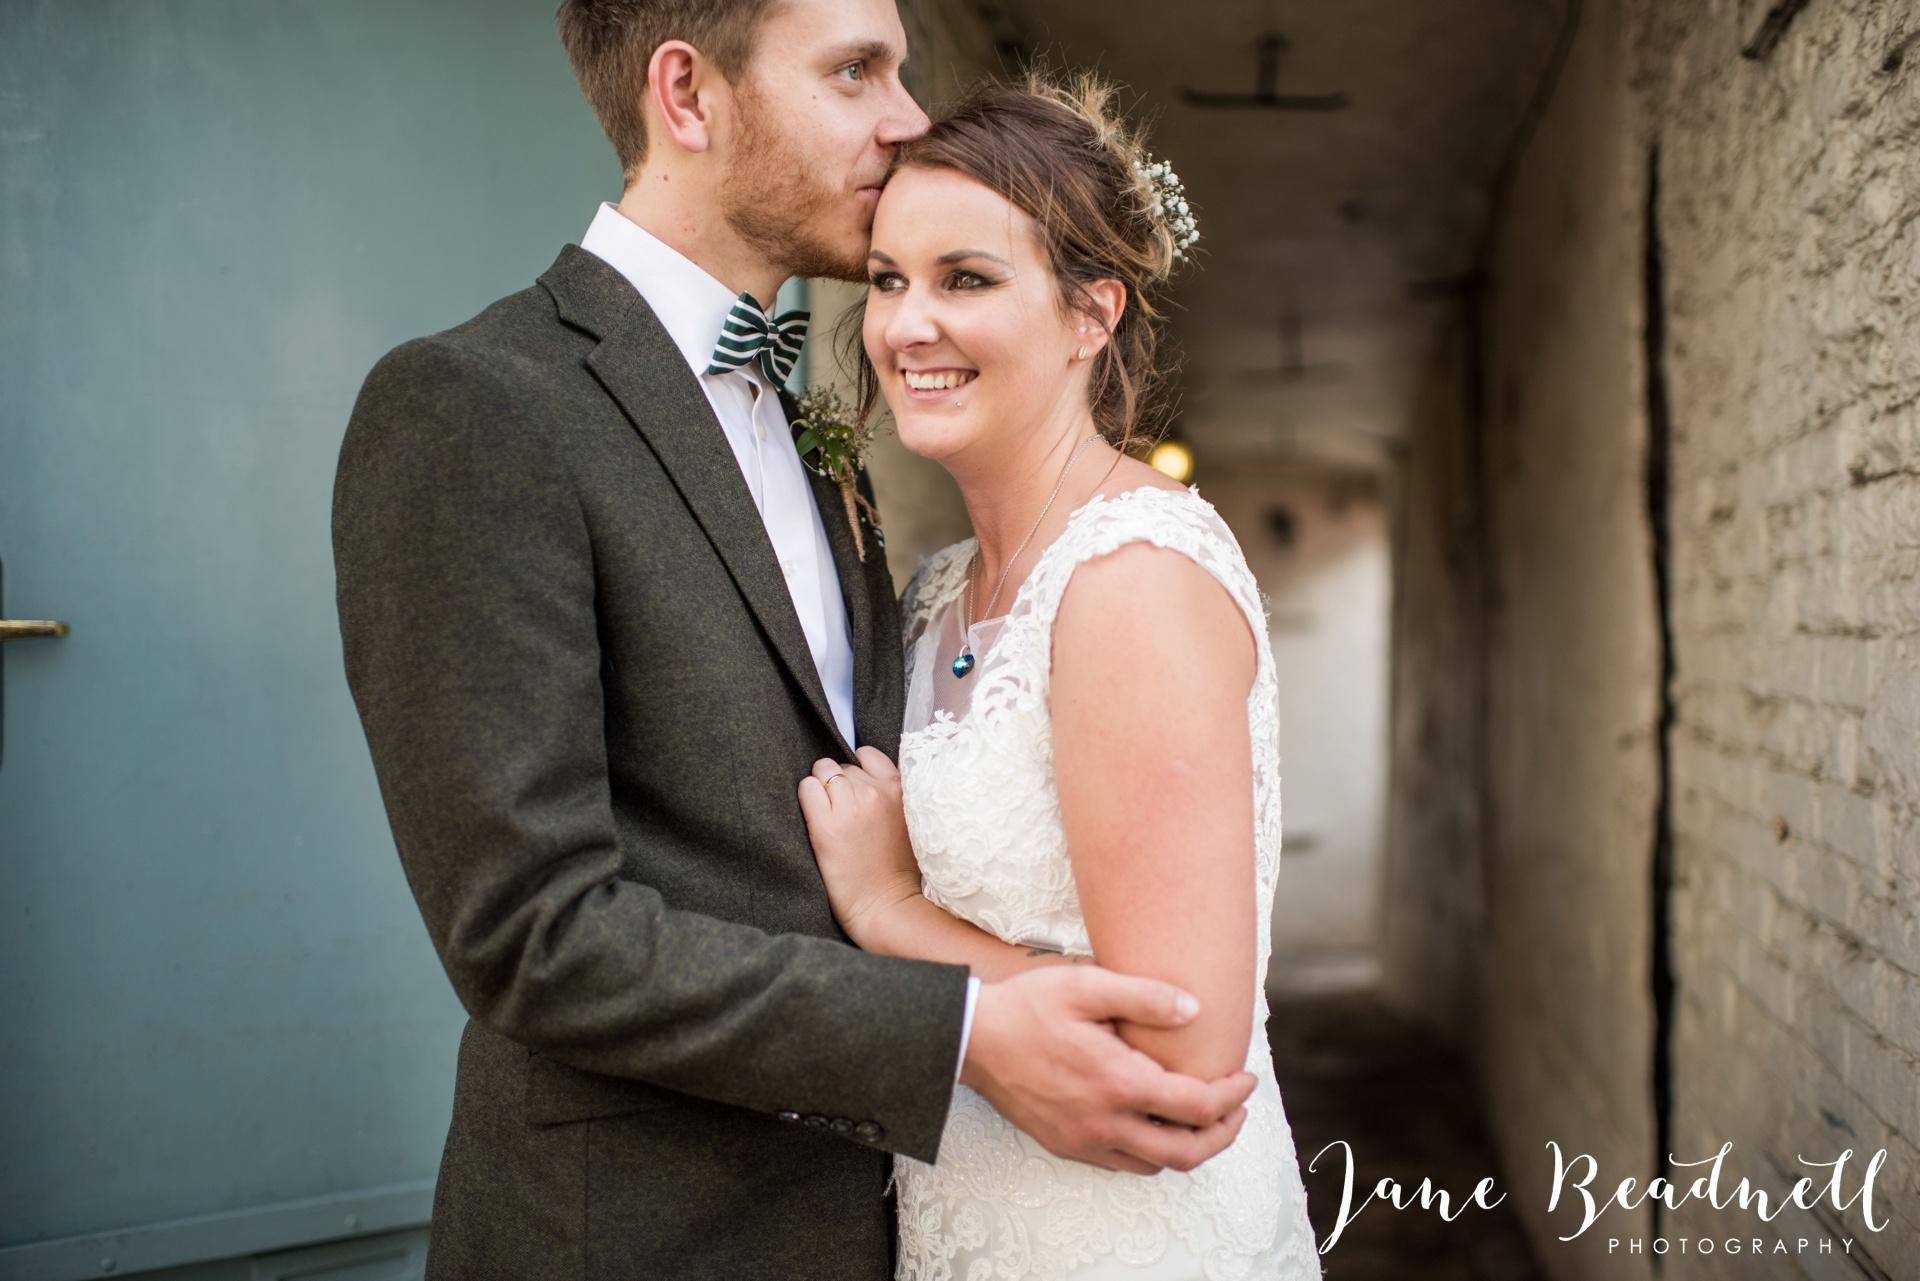 Jane Beadnell fine art wedding photographer The Old Deanery Ripon_0077